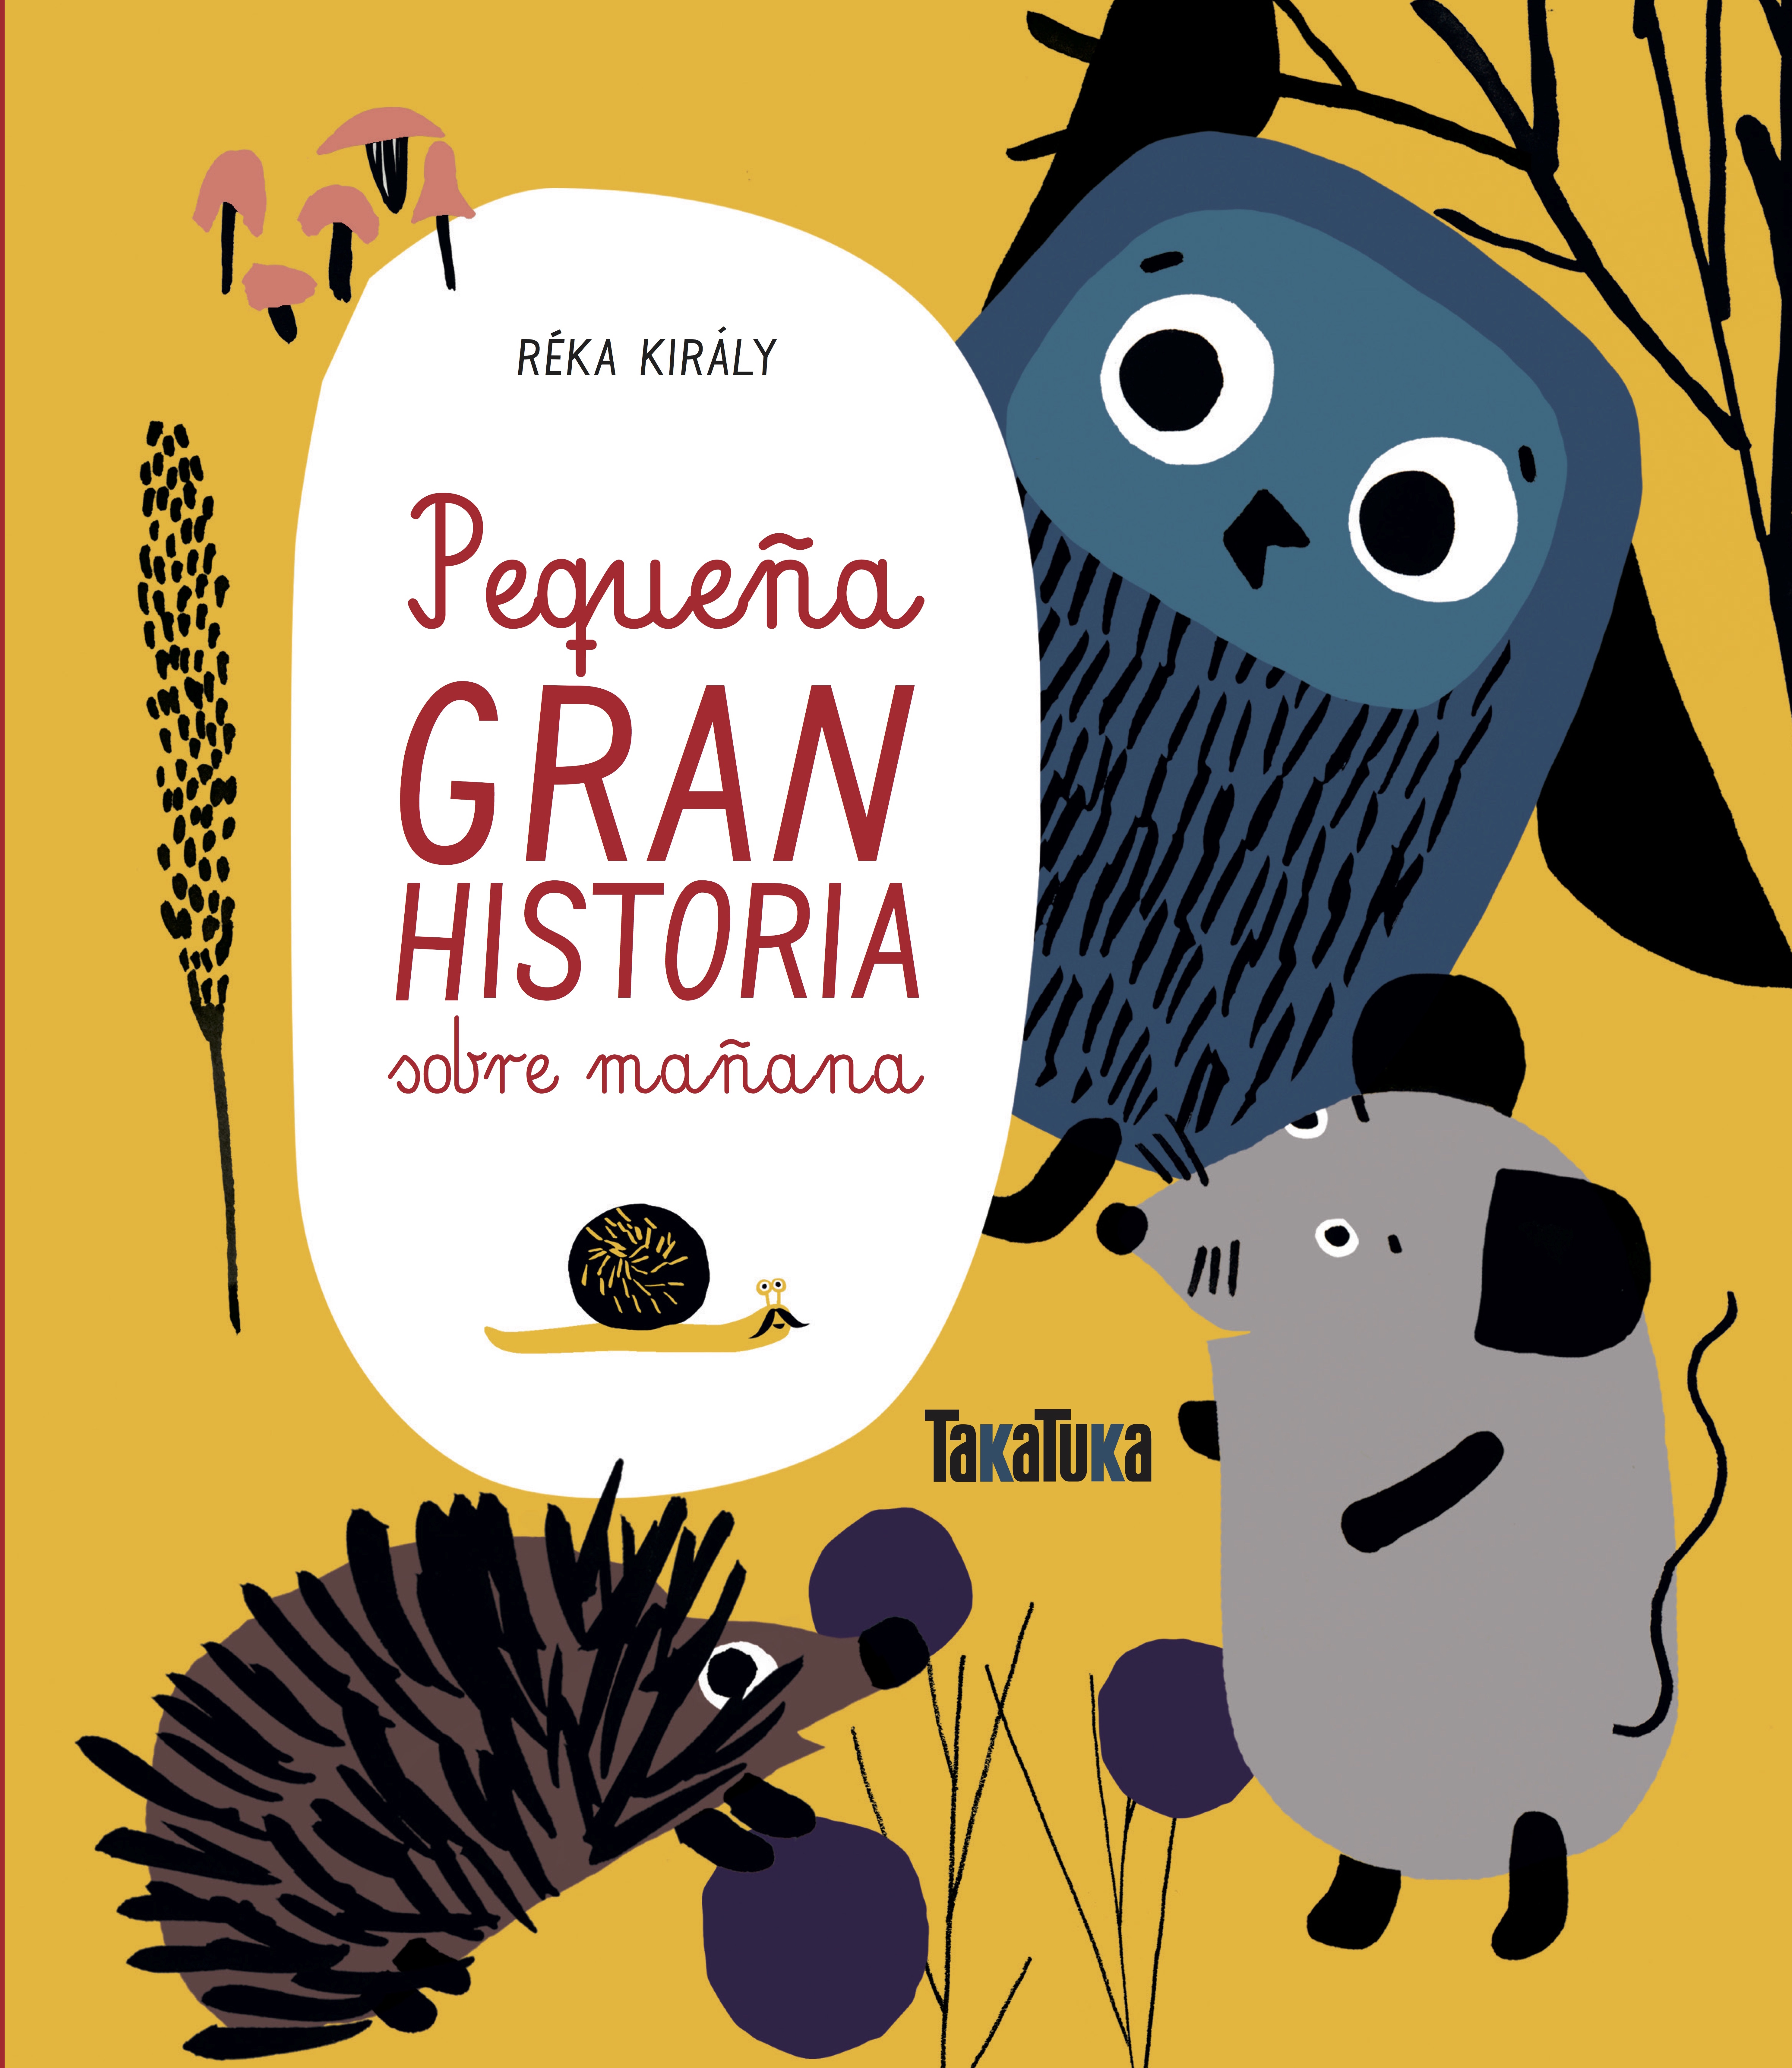 pequena-gran-historia-sobre-manana-978-84-17383-37-4